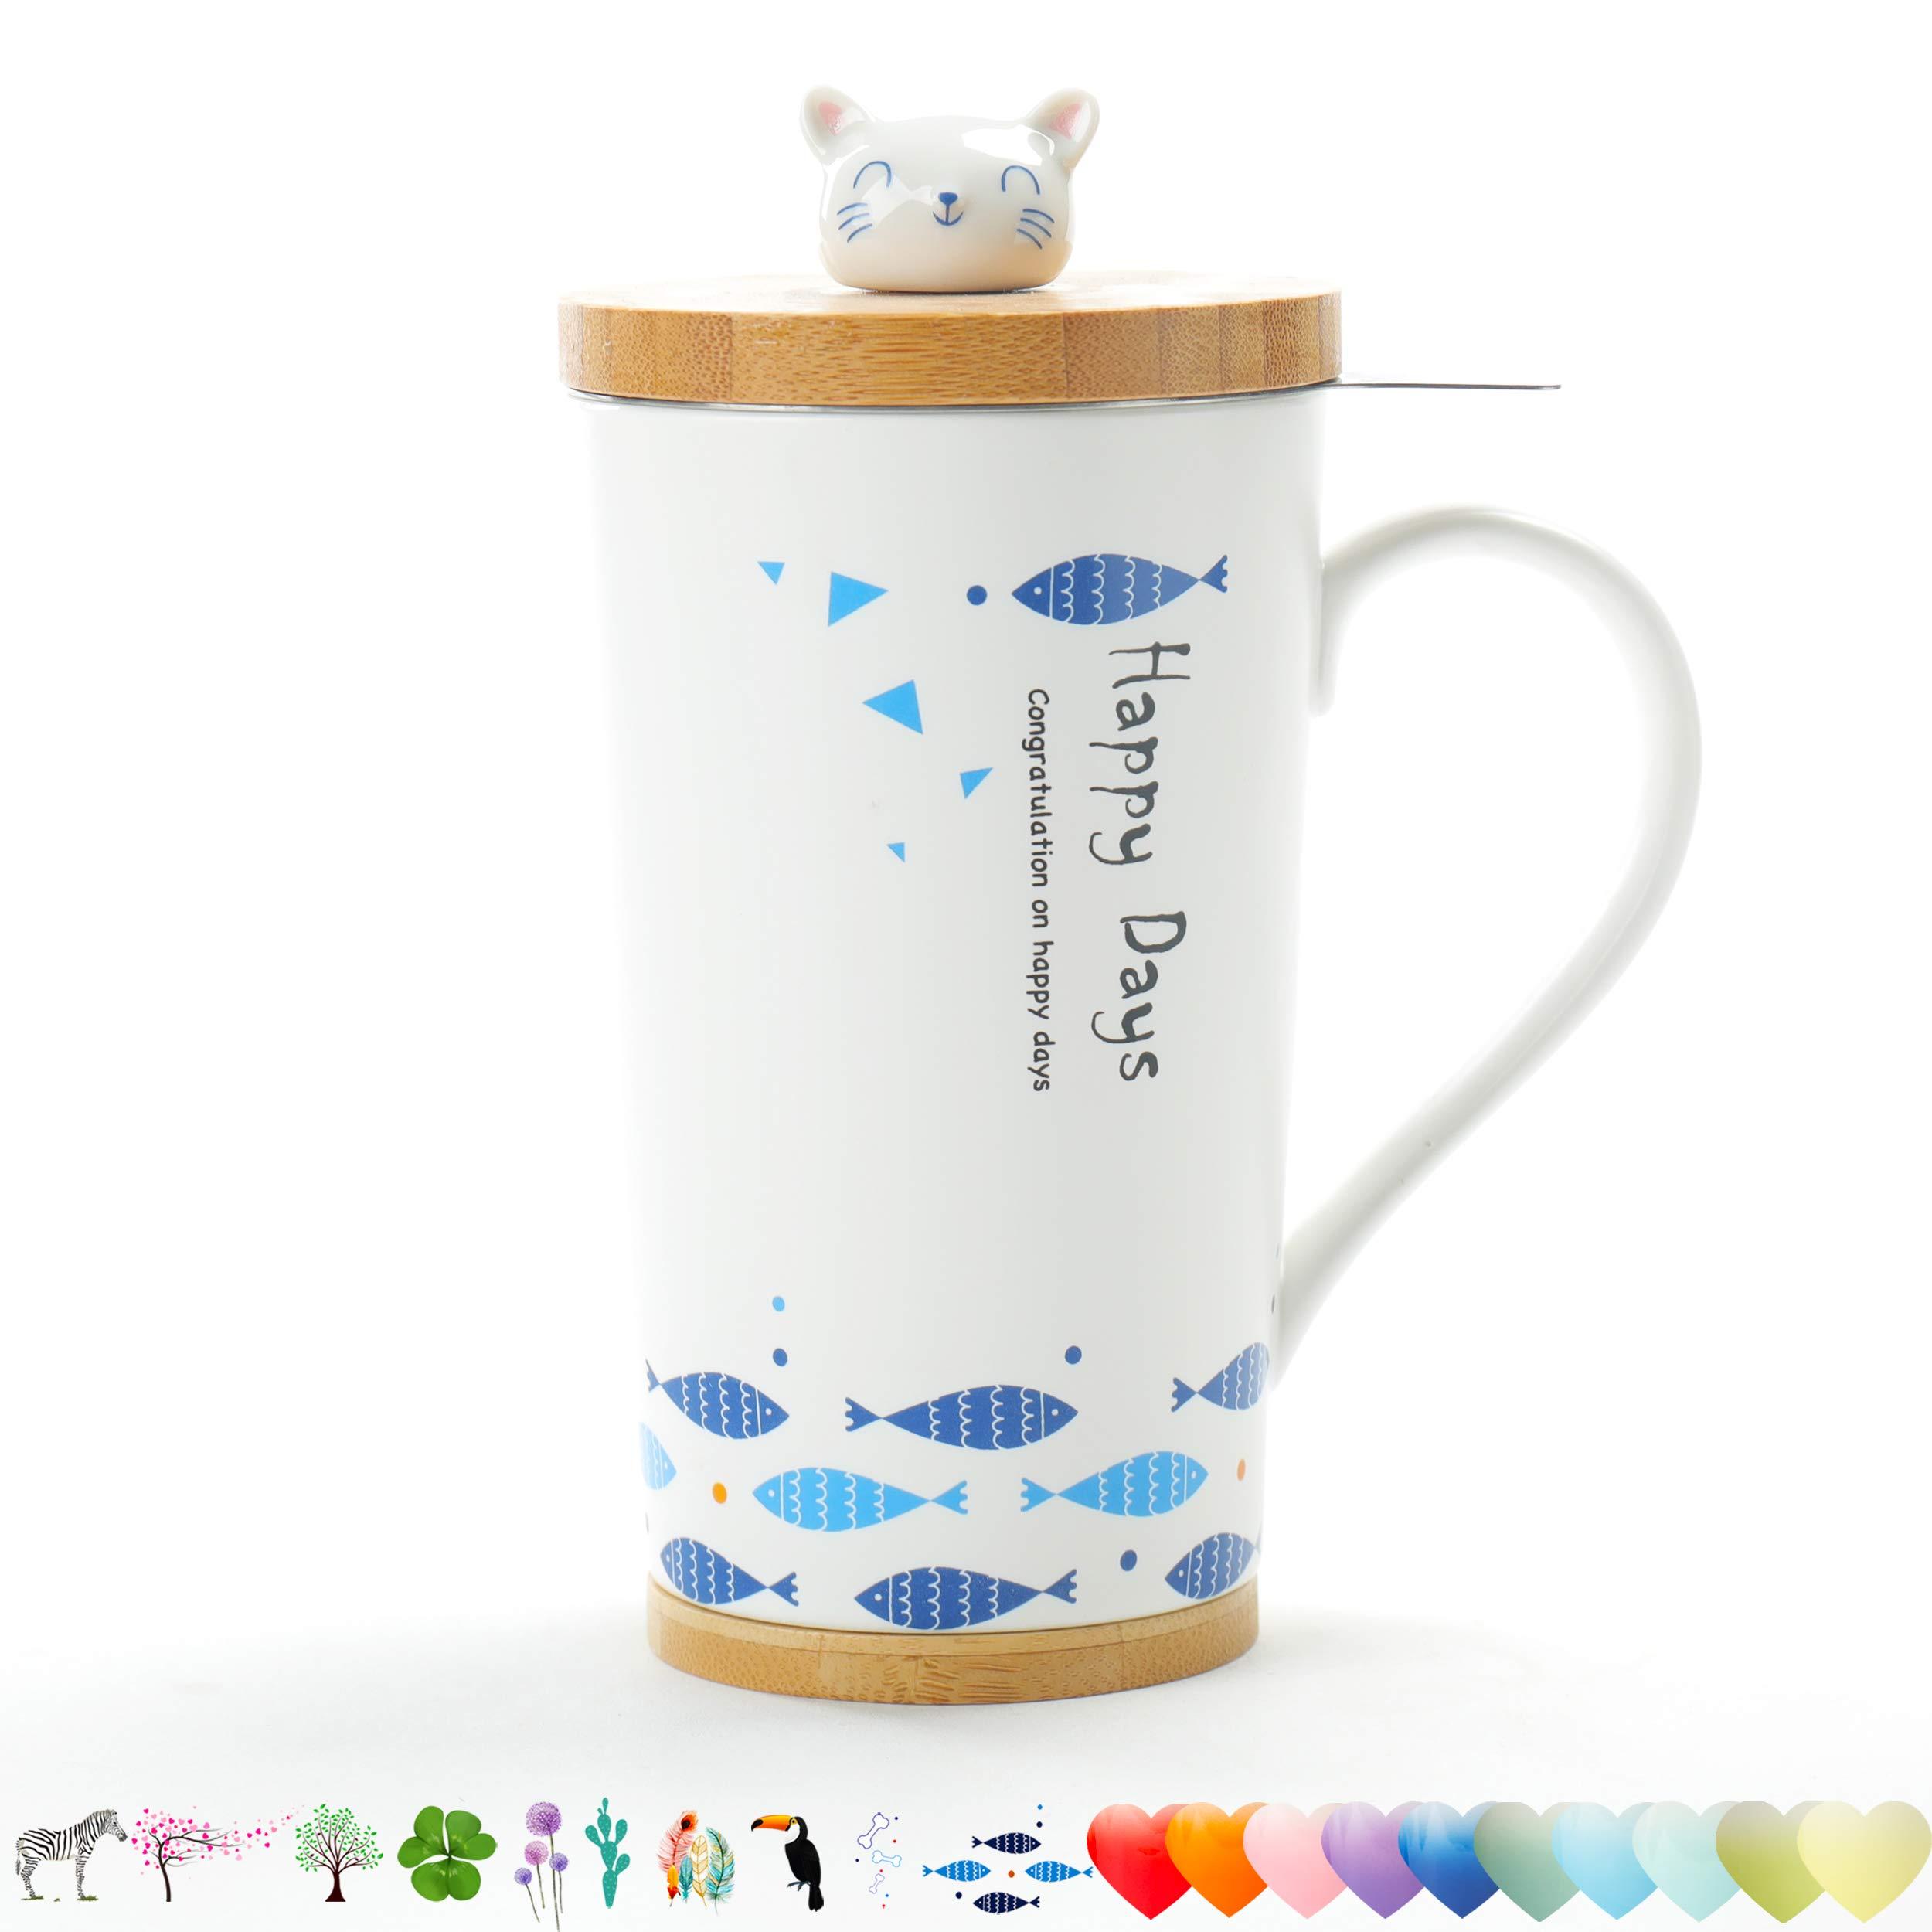 TEANAGOO M58-6 Tea Cup with Filter and Lid, 18 OZ, Cat, Mom Dad Women Teaware with Infuser, Tea Mug Steeper Maker, Brewing Strainer for Loose Leaf Tea, Diffuser mug set for Lover Gift teacup Porcelain by TEANAGOO